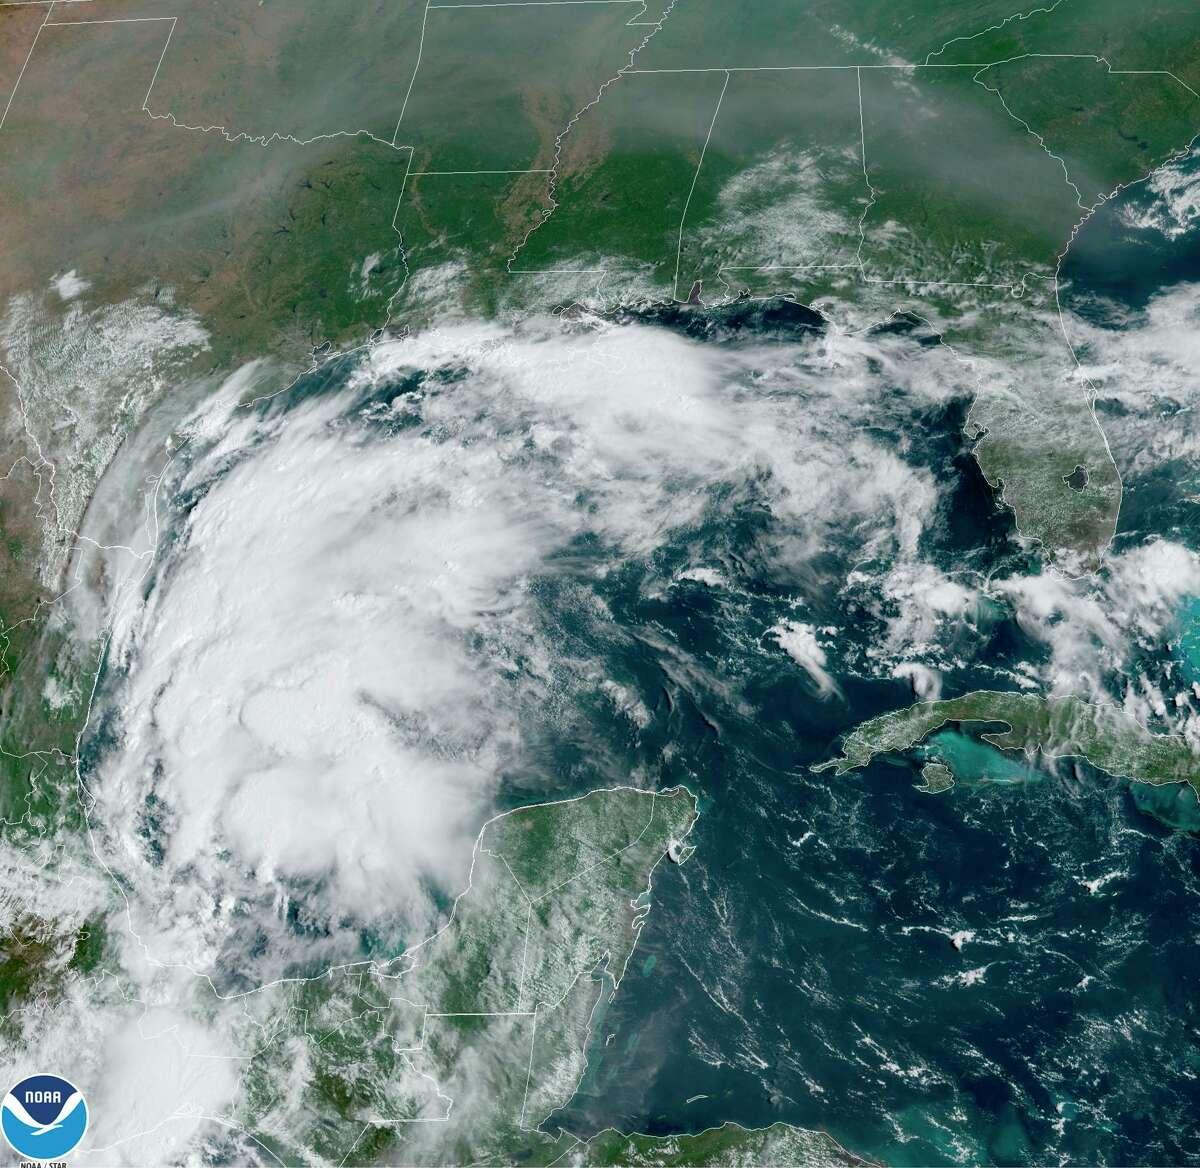 Imagen satelital de la tormenta Nicholas en el Golfo de México, el 12 de septiembre de 2021.